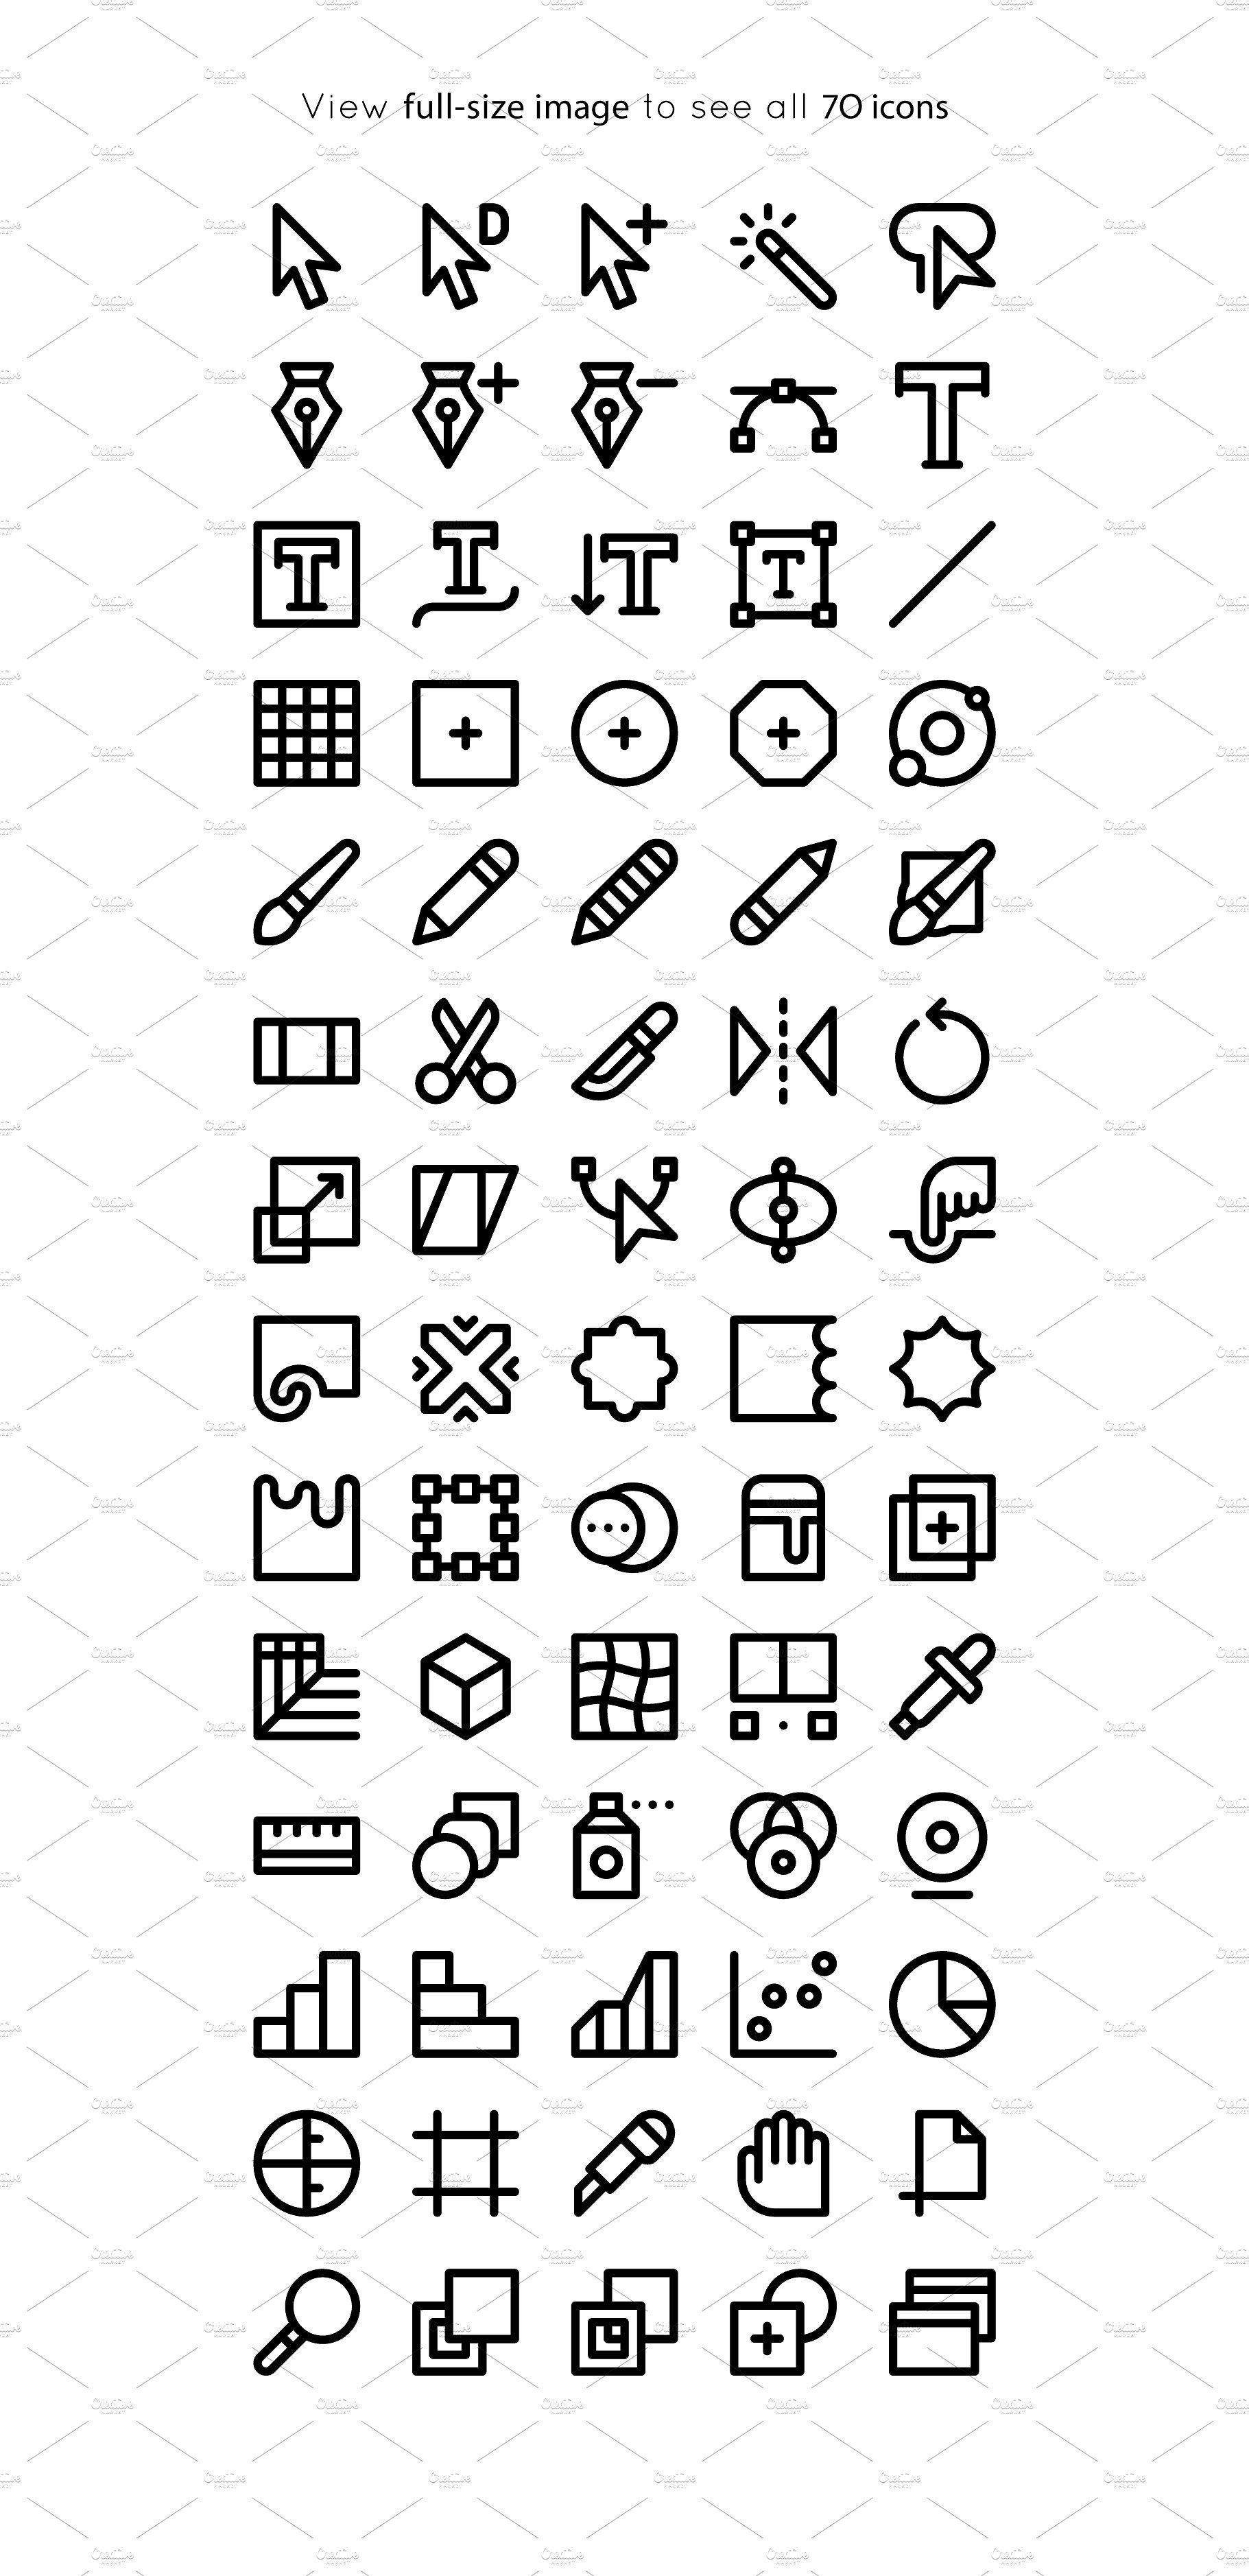 Bold Adobe Illustrator Tool Icons